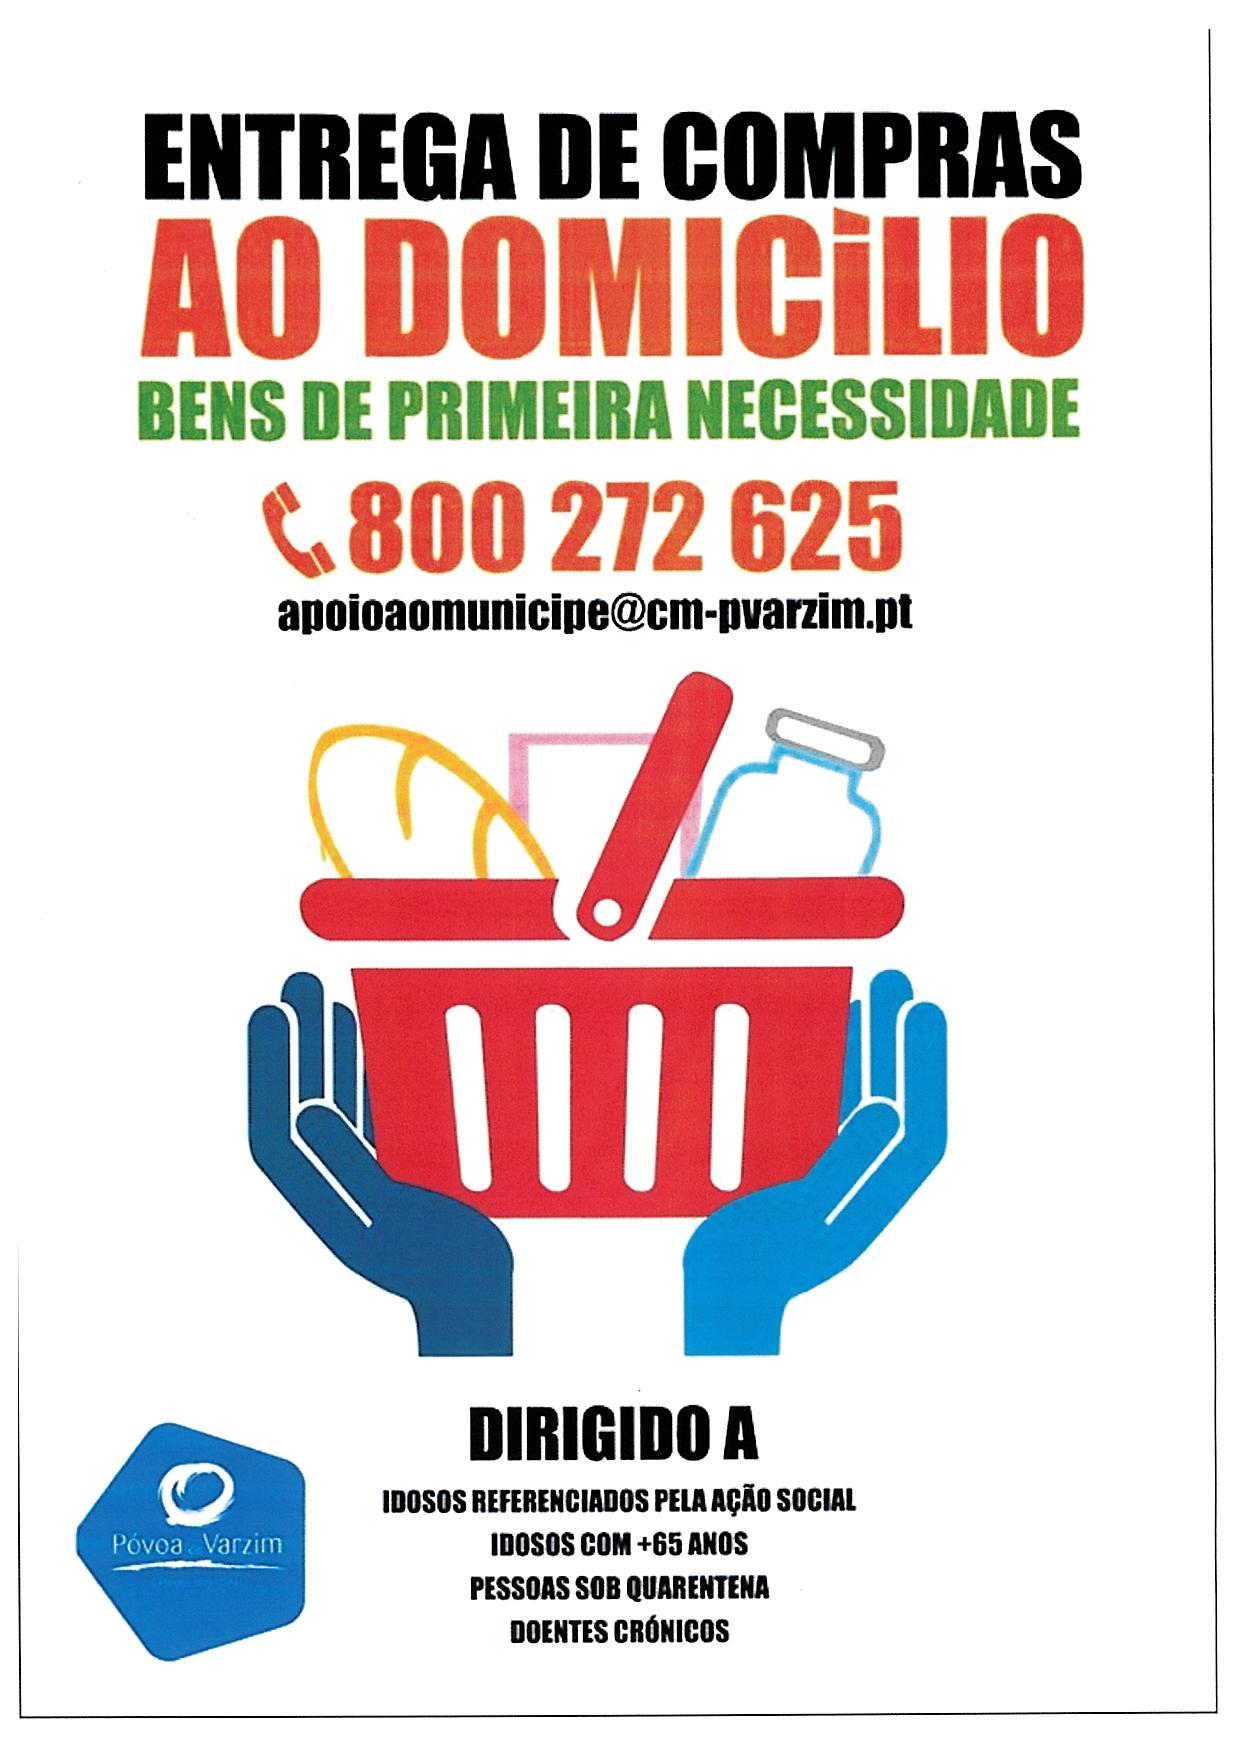 ENTREGA DE COMPRAS AO DOMICILIO BENS DE PRIMEIRA NECESSIDADE